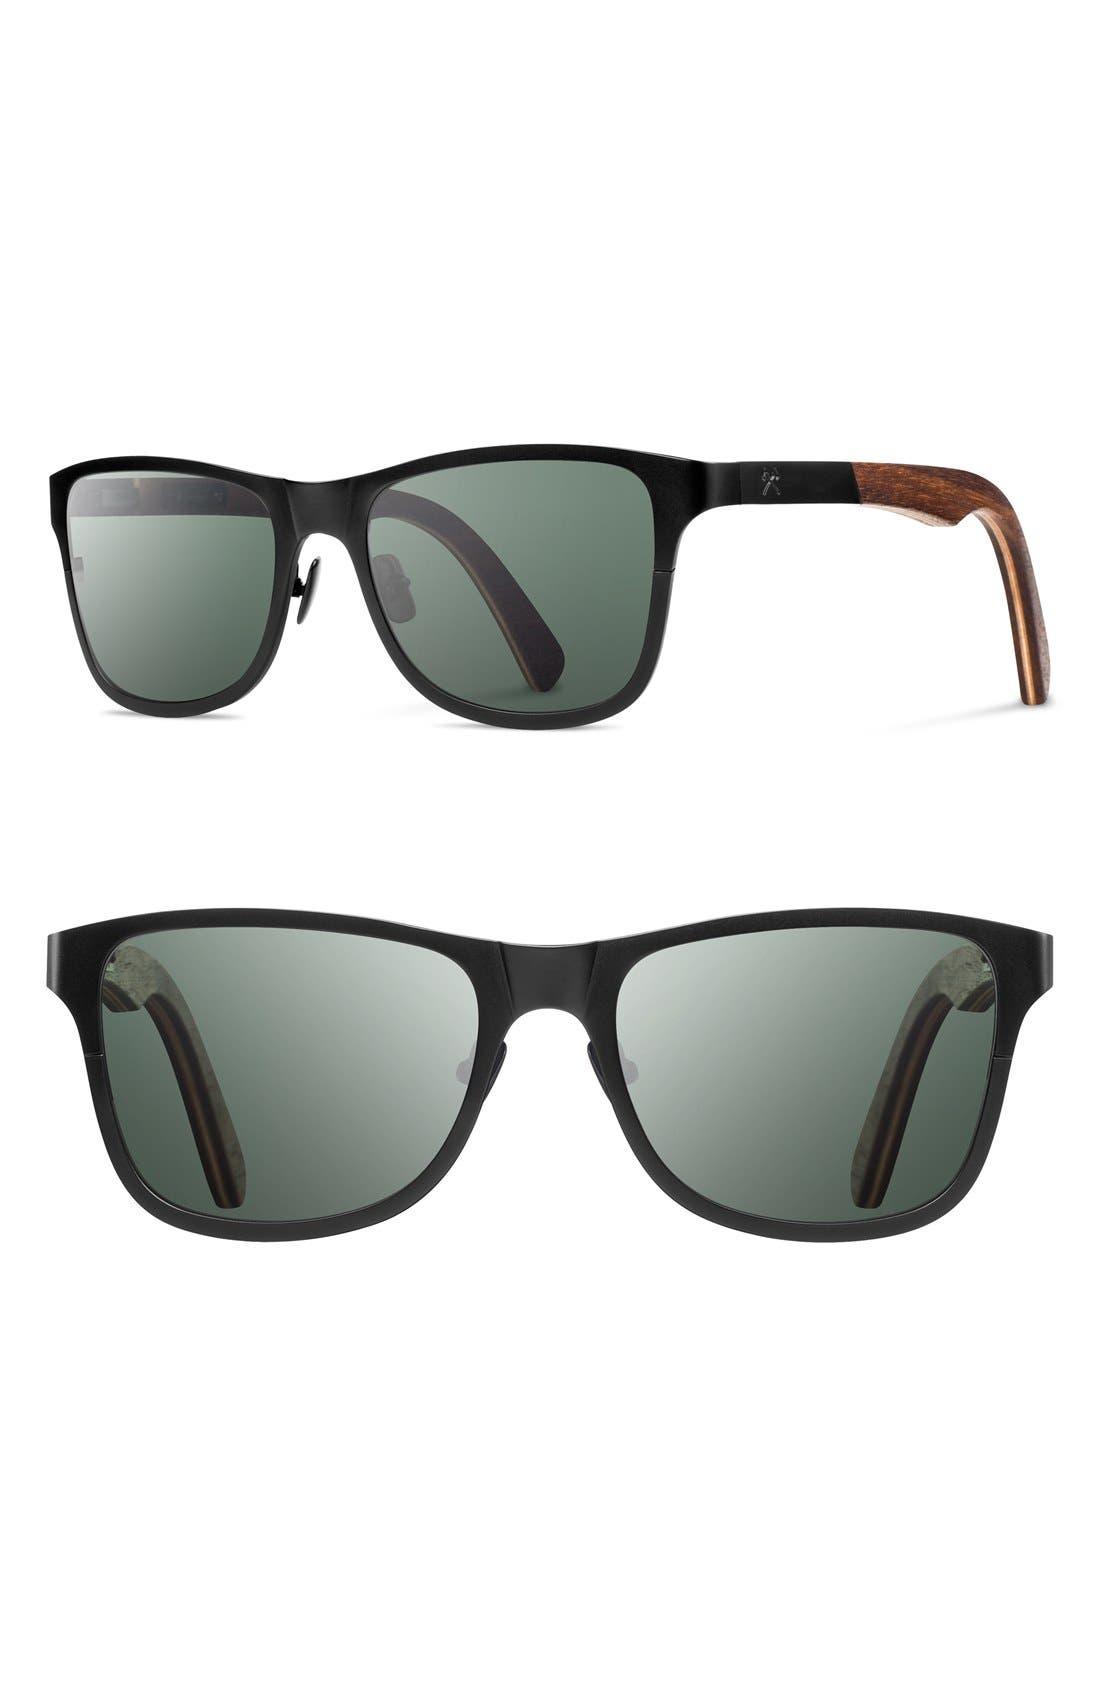 'Canby' 54mm Polarized Titanium & Wood Sunglasses,                         Main,                         color, Black/ Walnut